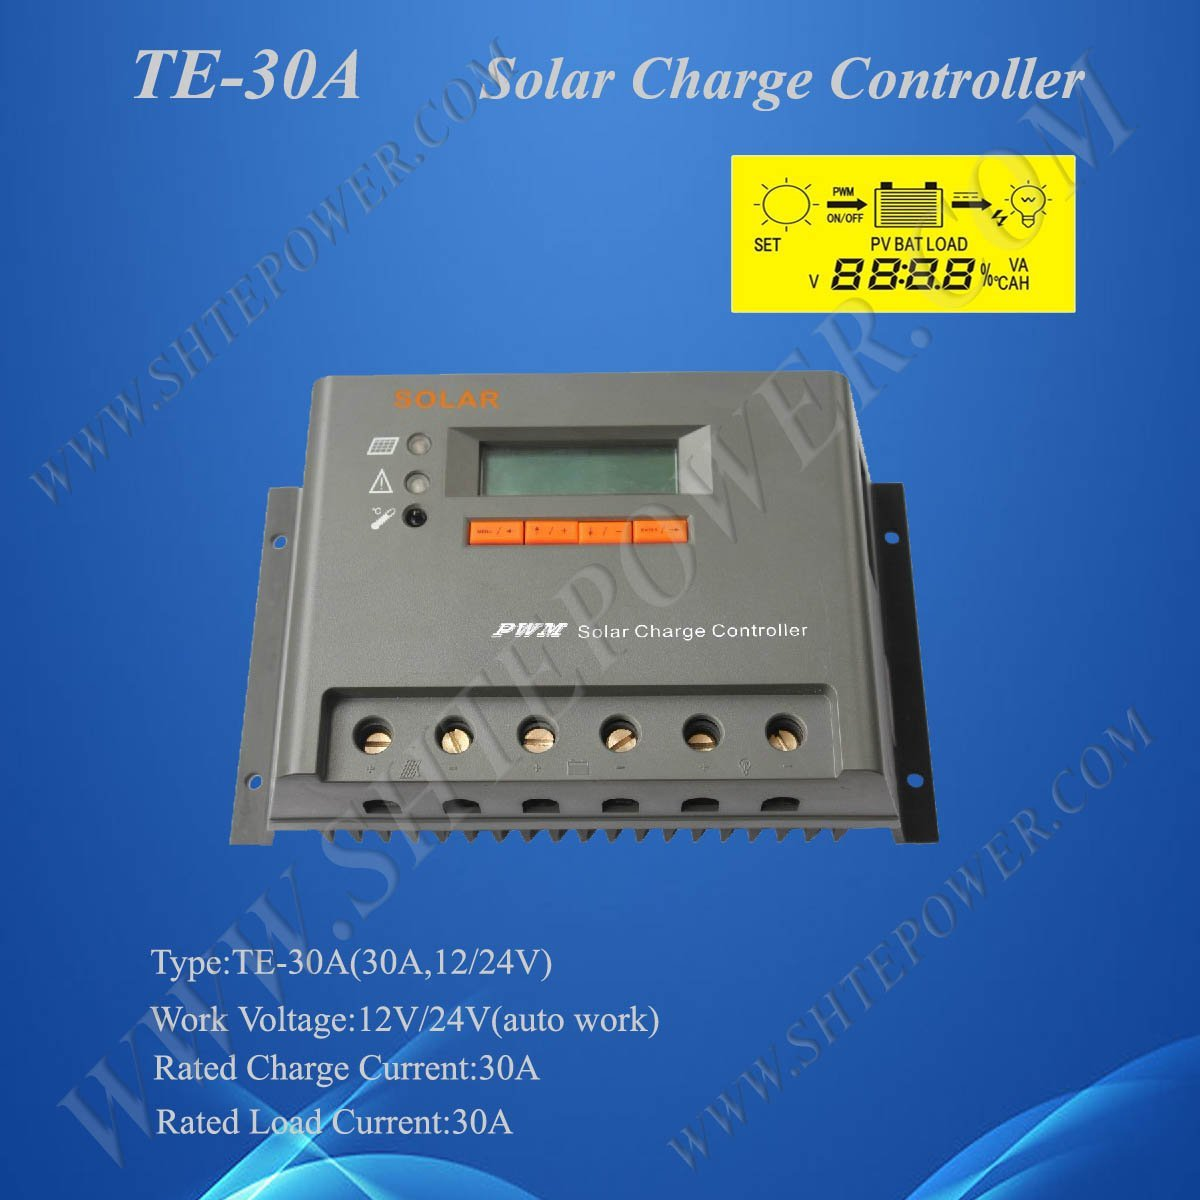 30A Солнечная зарядка Cotroller 12 V/24 V авто работа для продажи